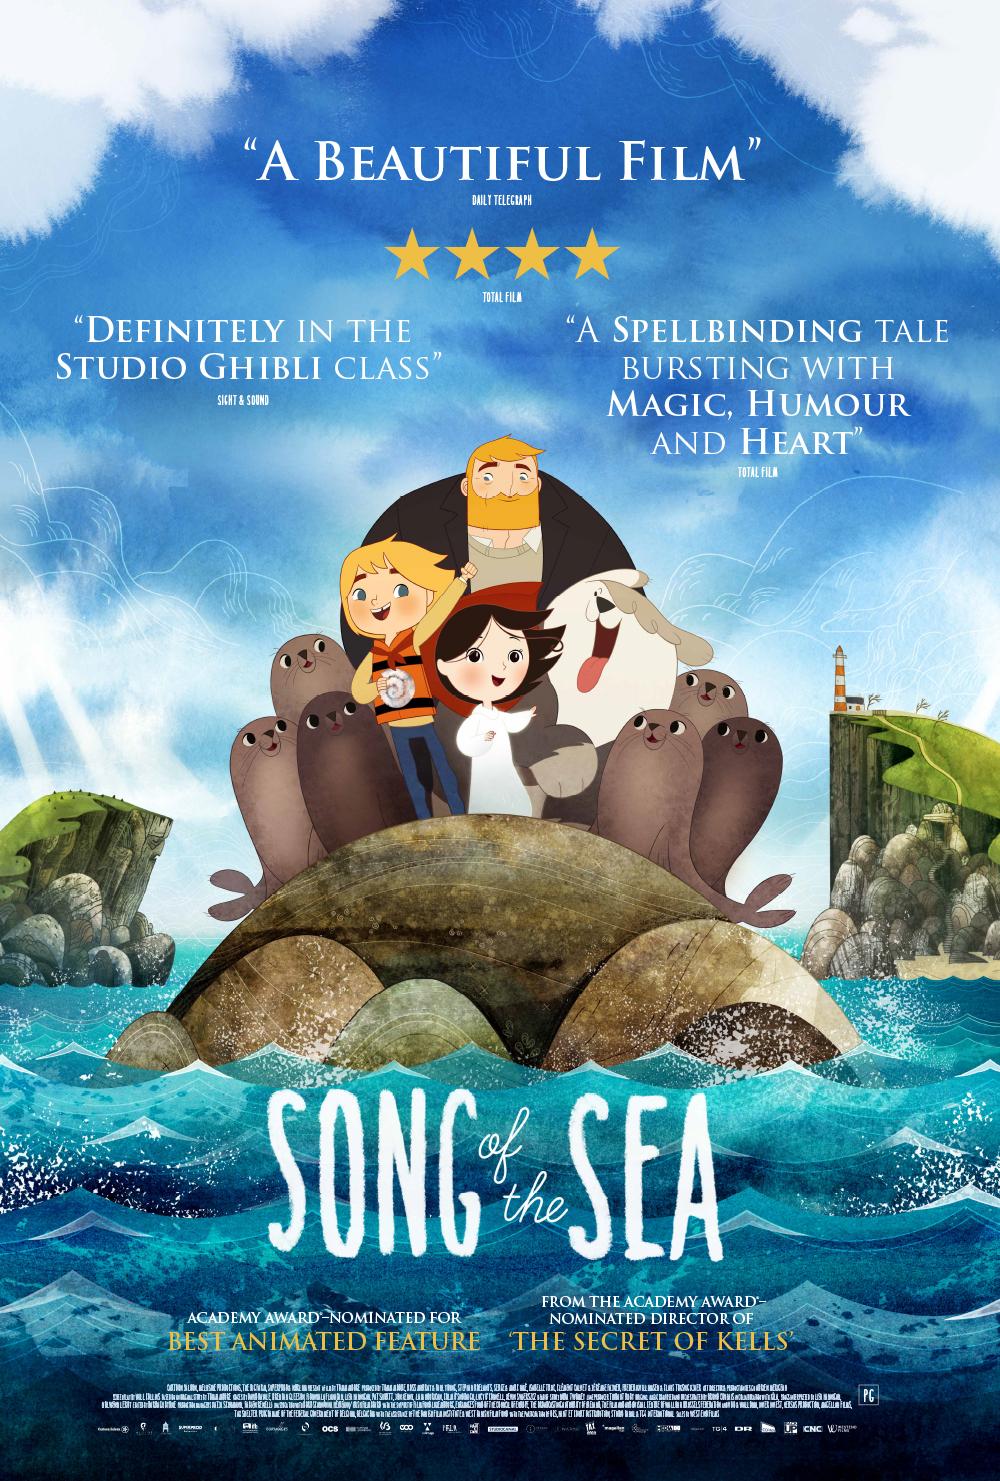 دانلود انیمیشن Song of the Sea 2014 دوبله فارسی